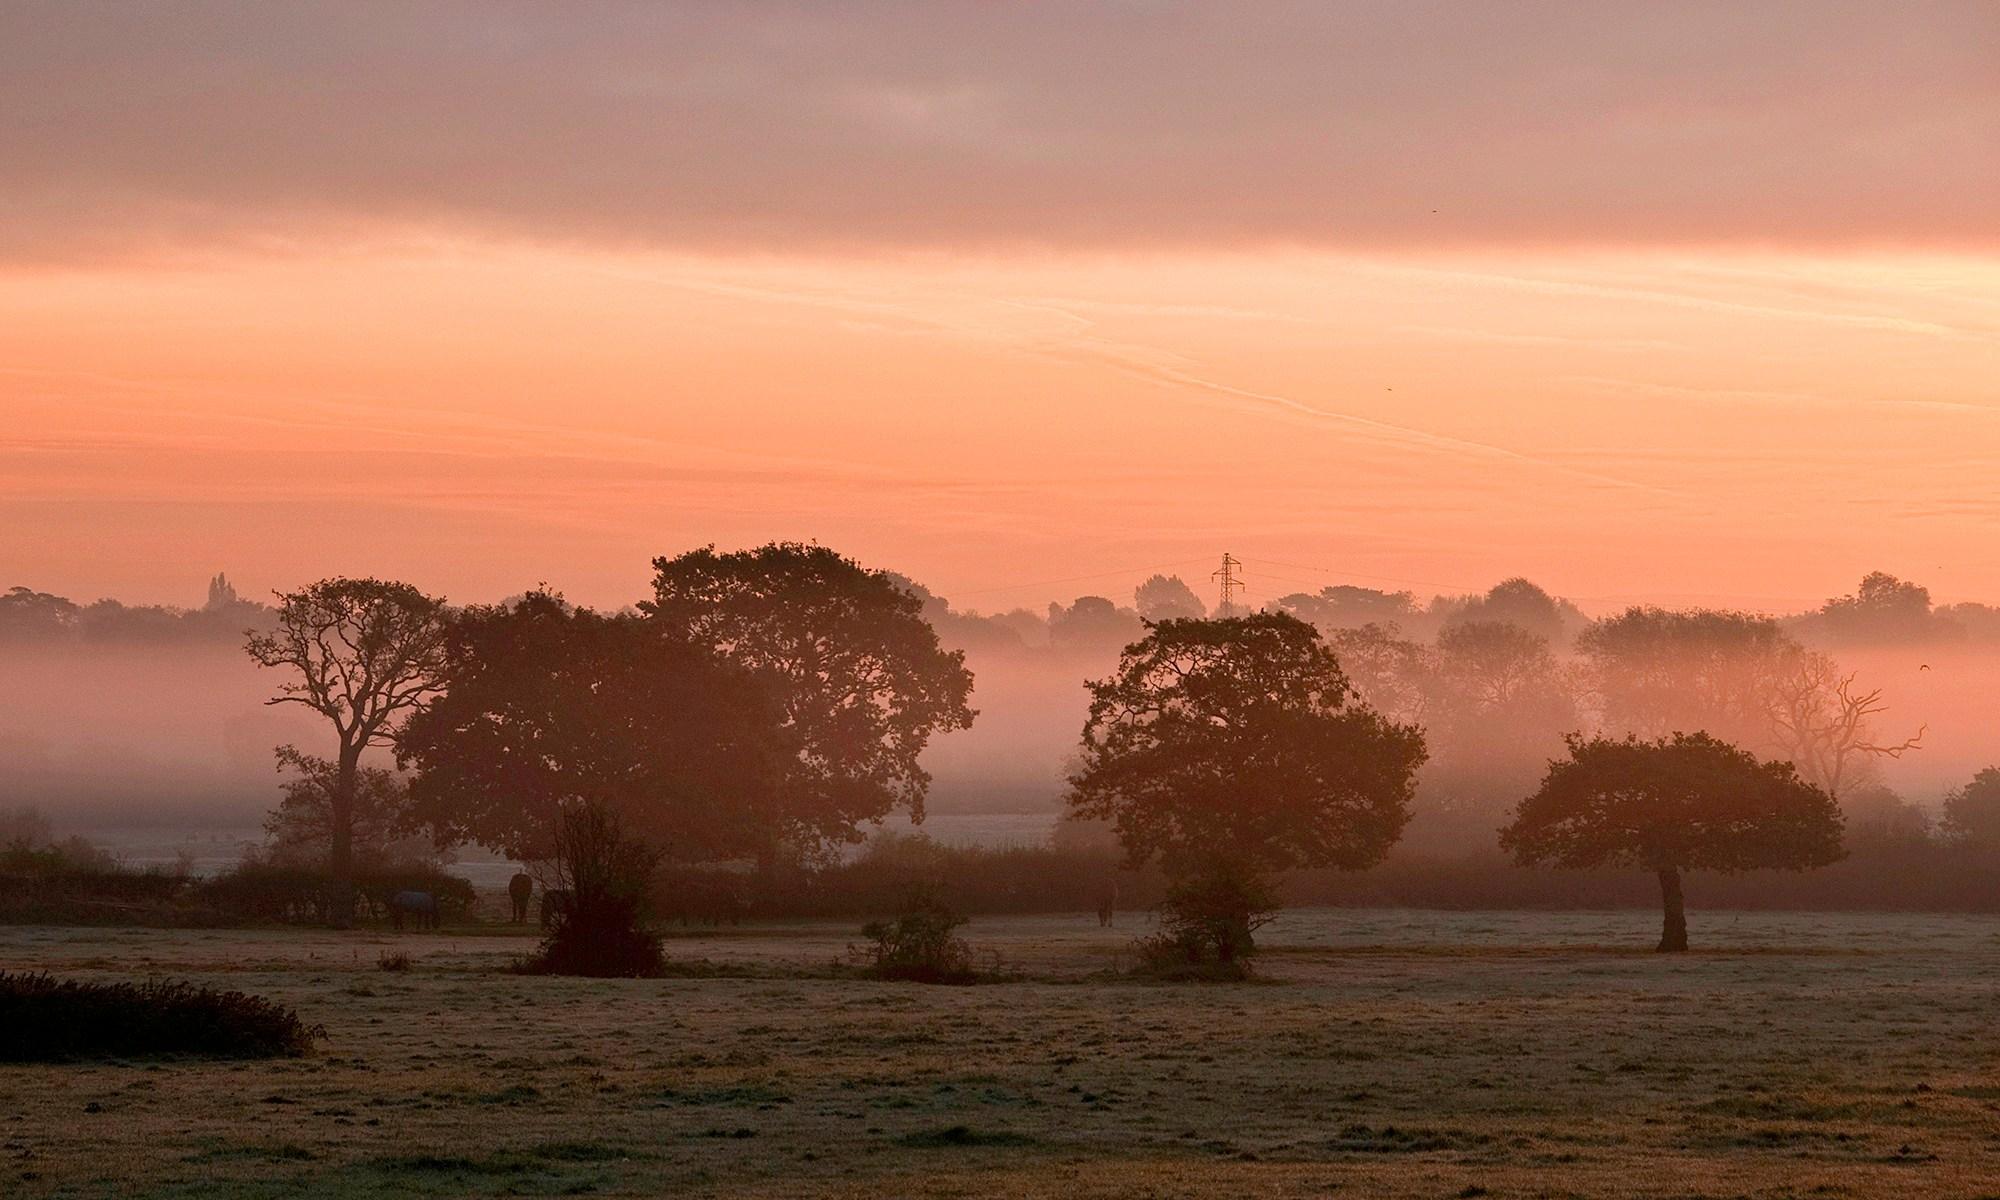 Sunrise from Ash Lane, Hale, Cheshire